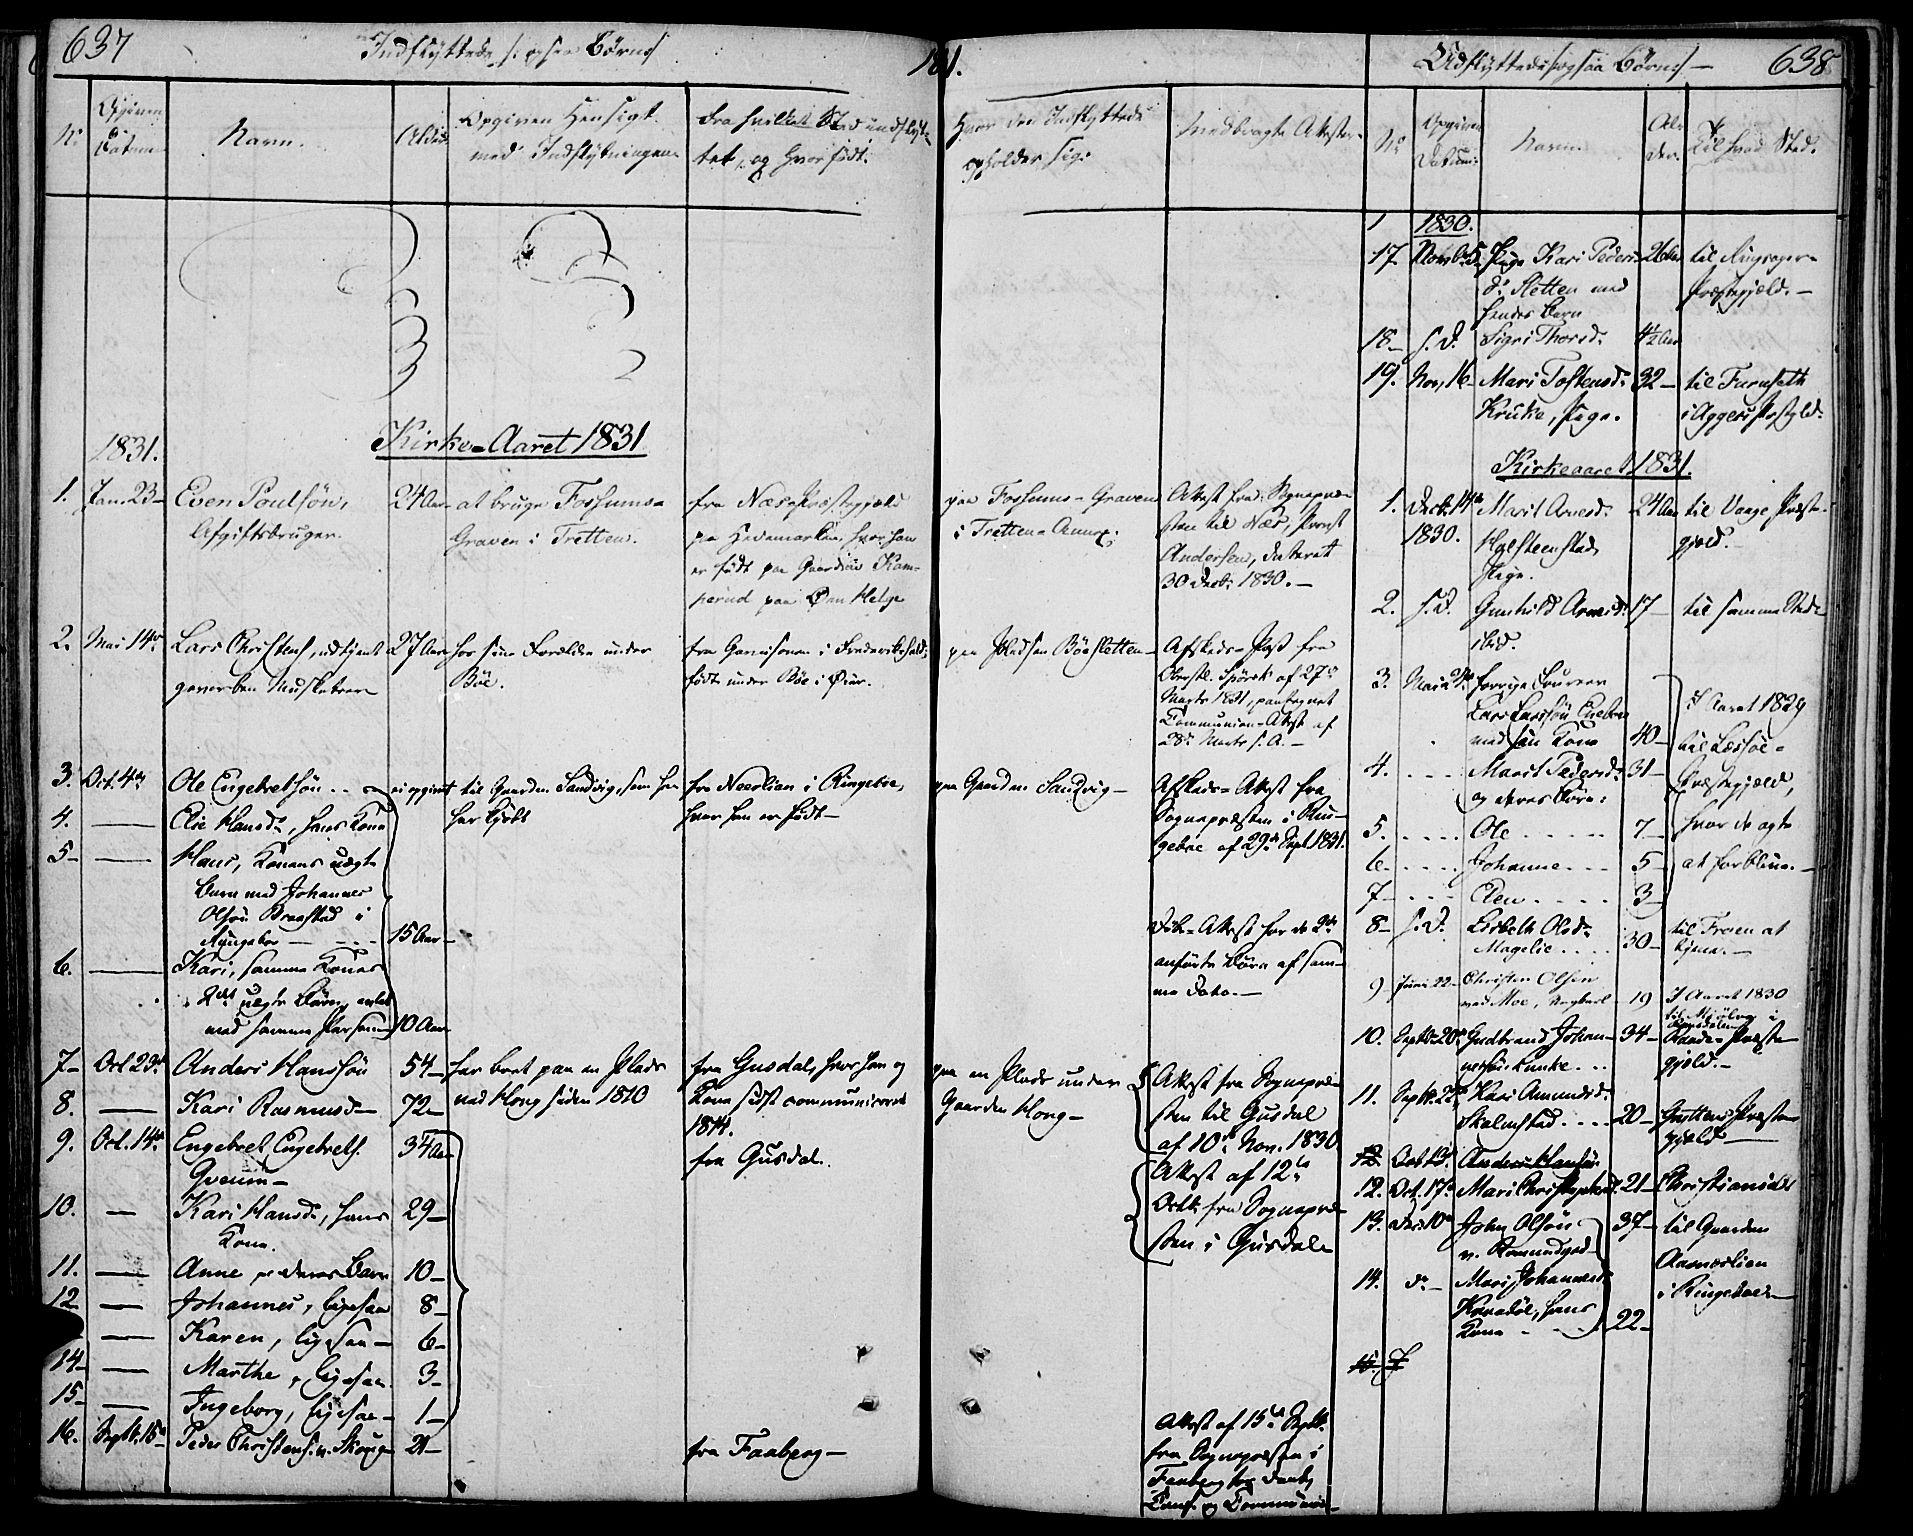 SAH, Øyer prestekontor, Ministerialbok nr. 4, 1824-1841, s. 637-638